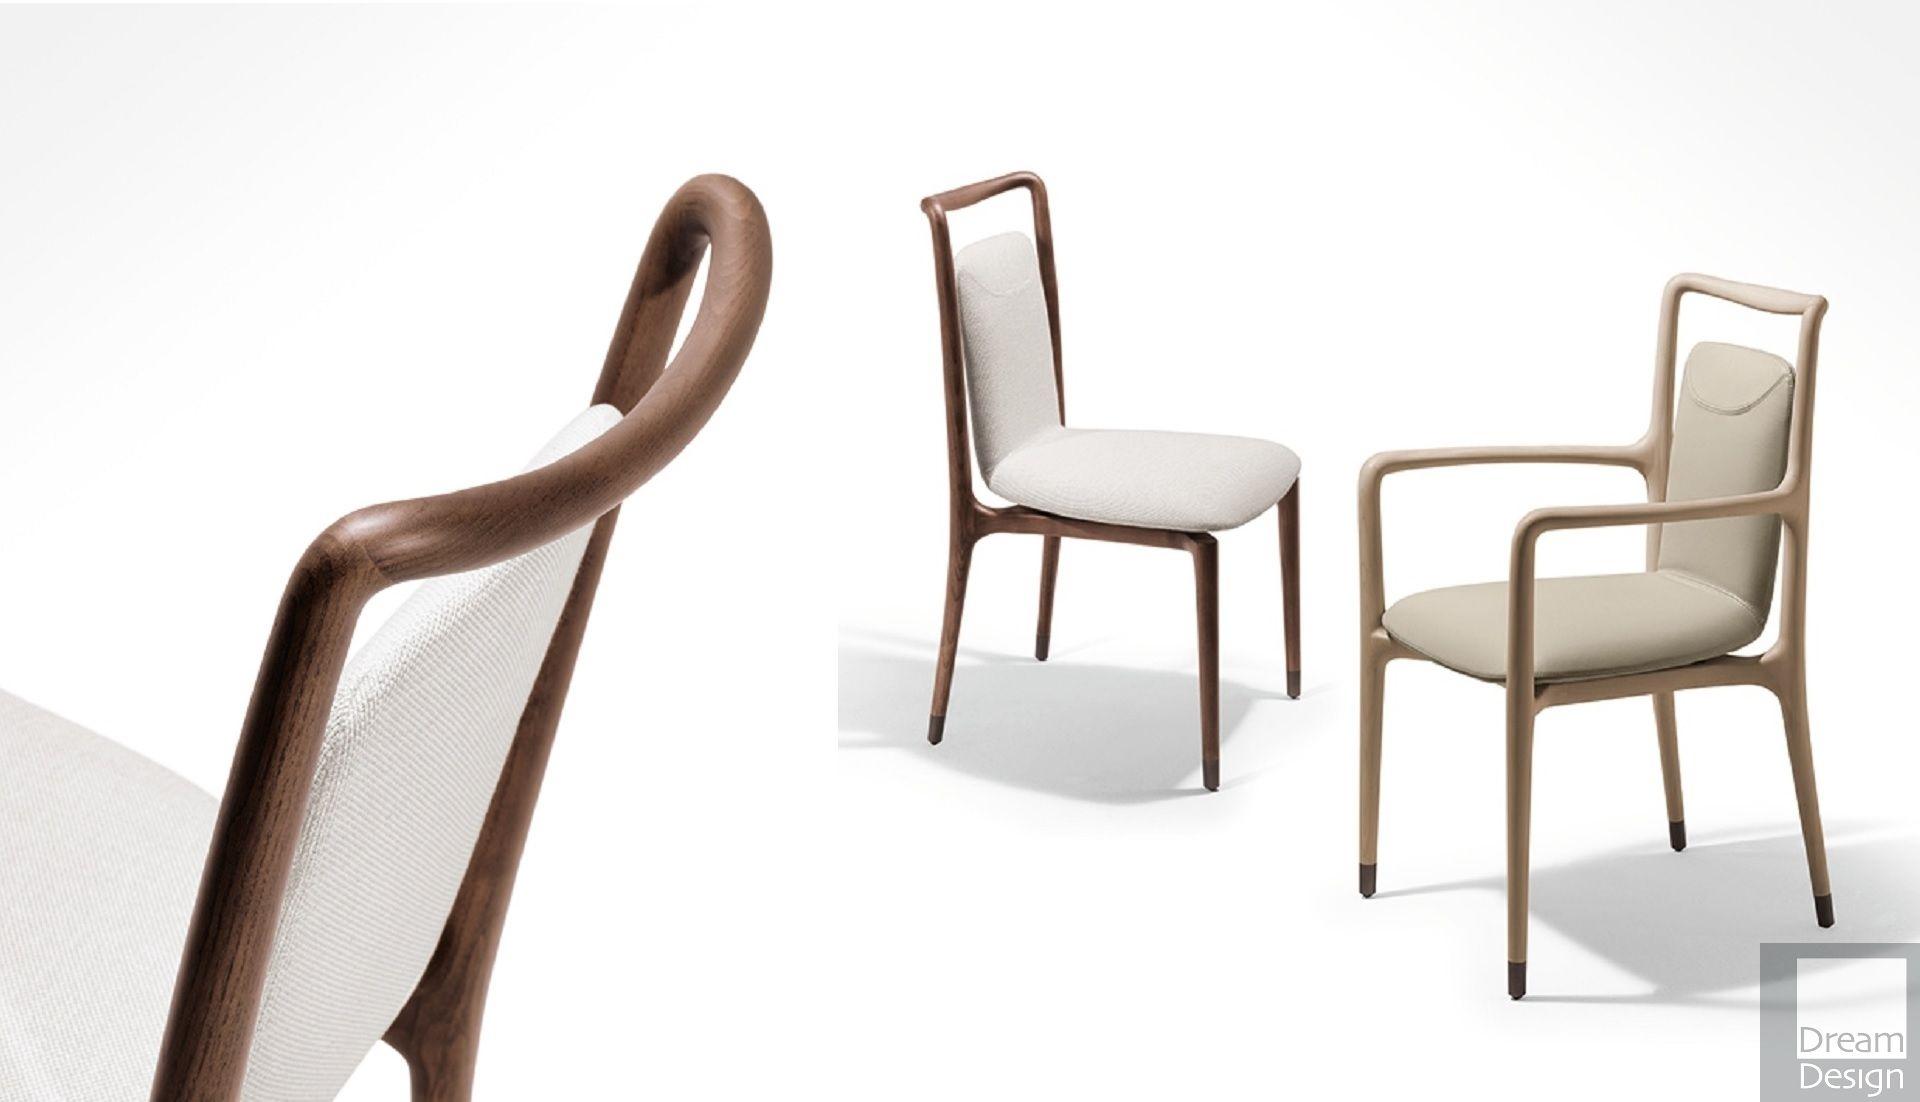 Ibla Chair in 2020 Furniture design, Chair